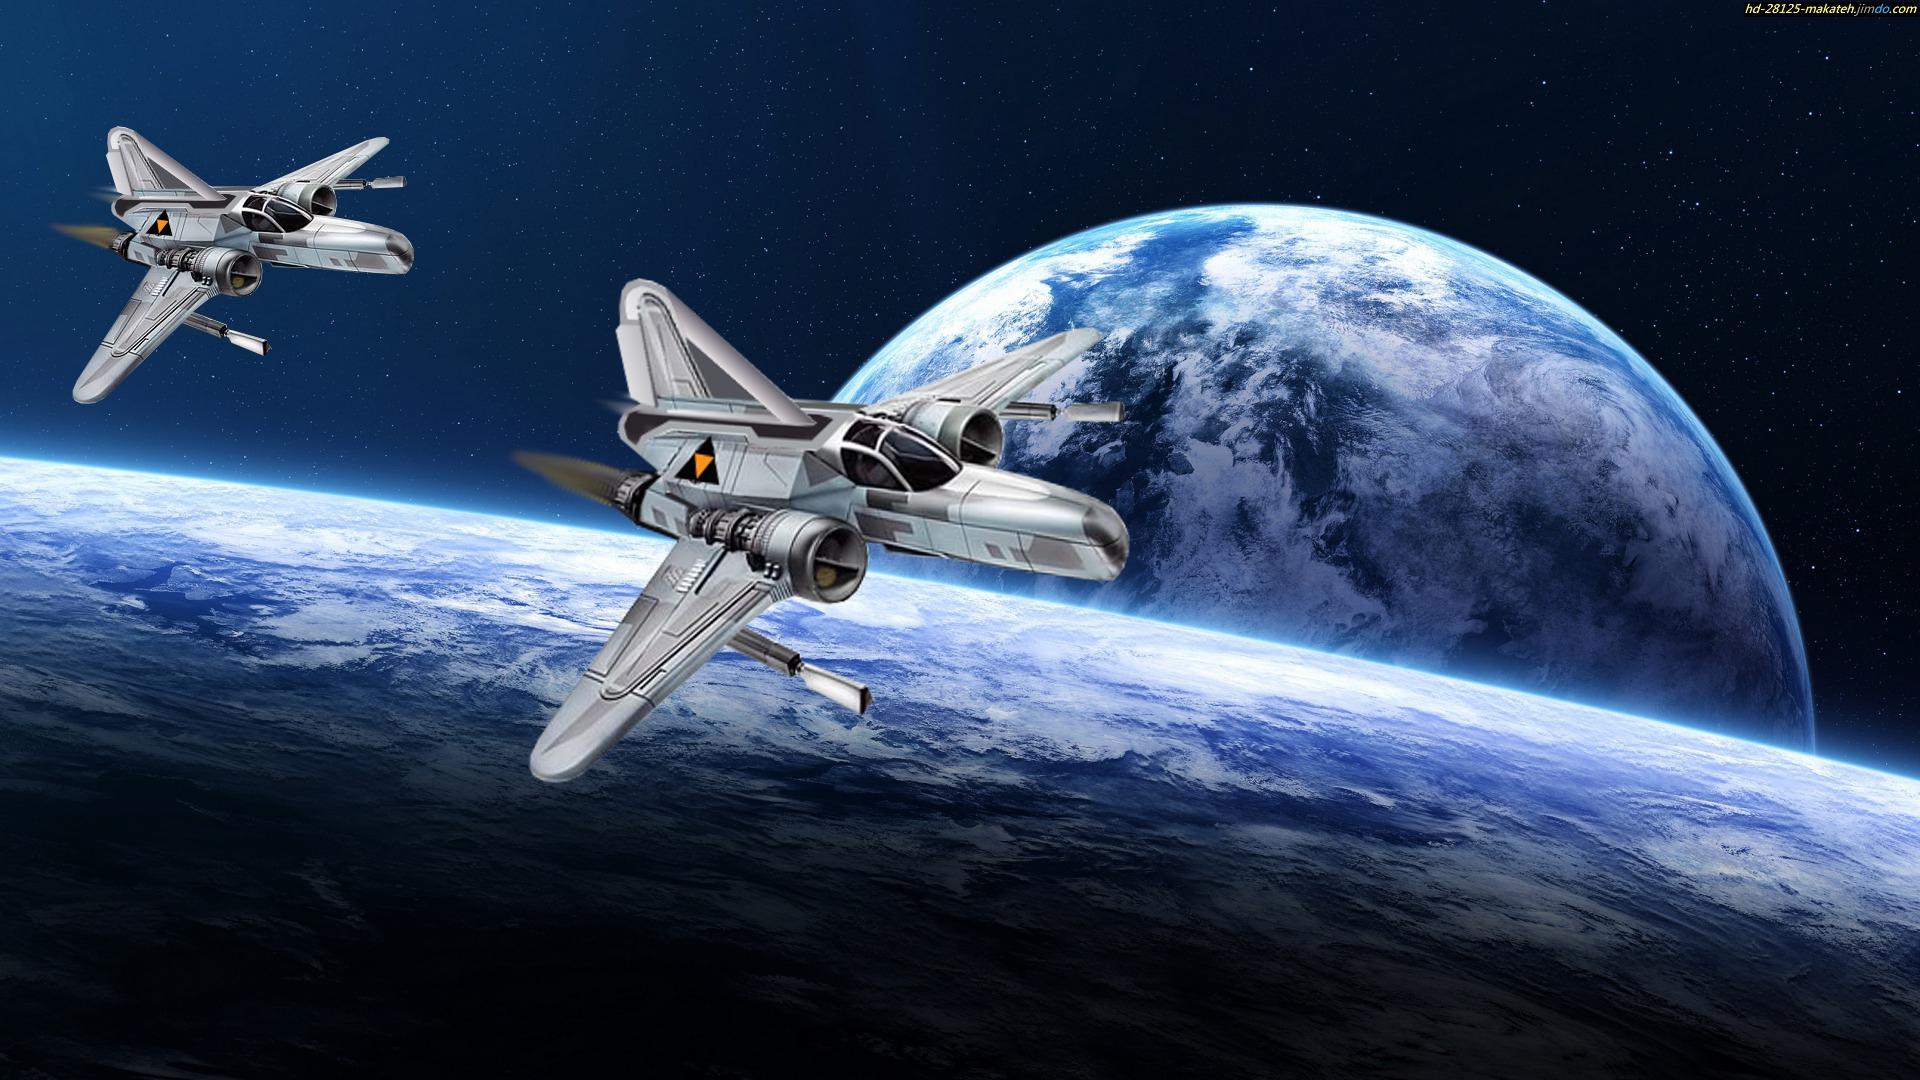 Sci fi ships wallpaper wallpapersafari for Sci fi background